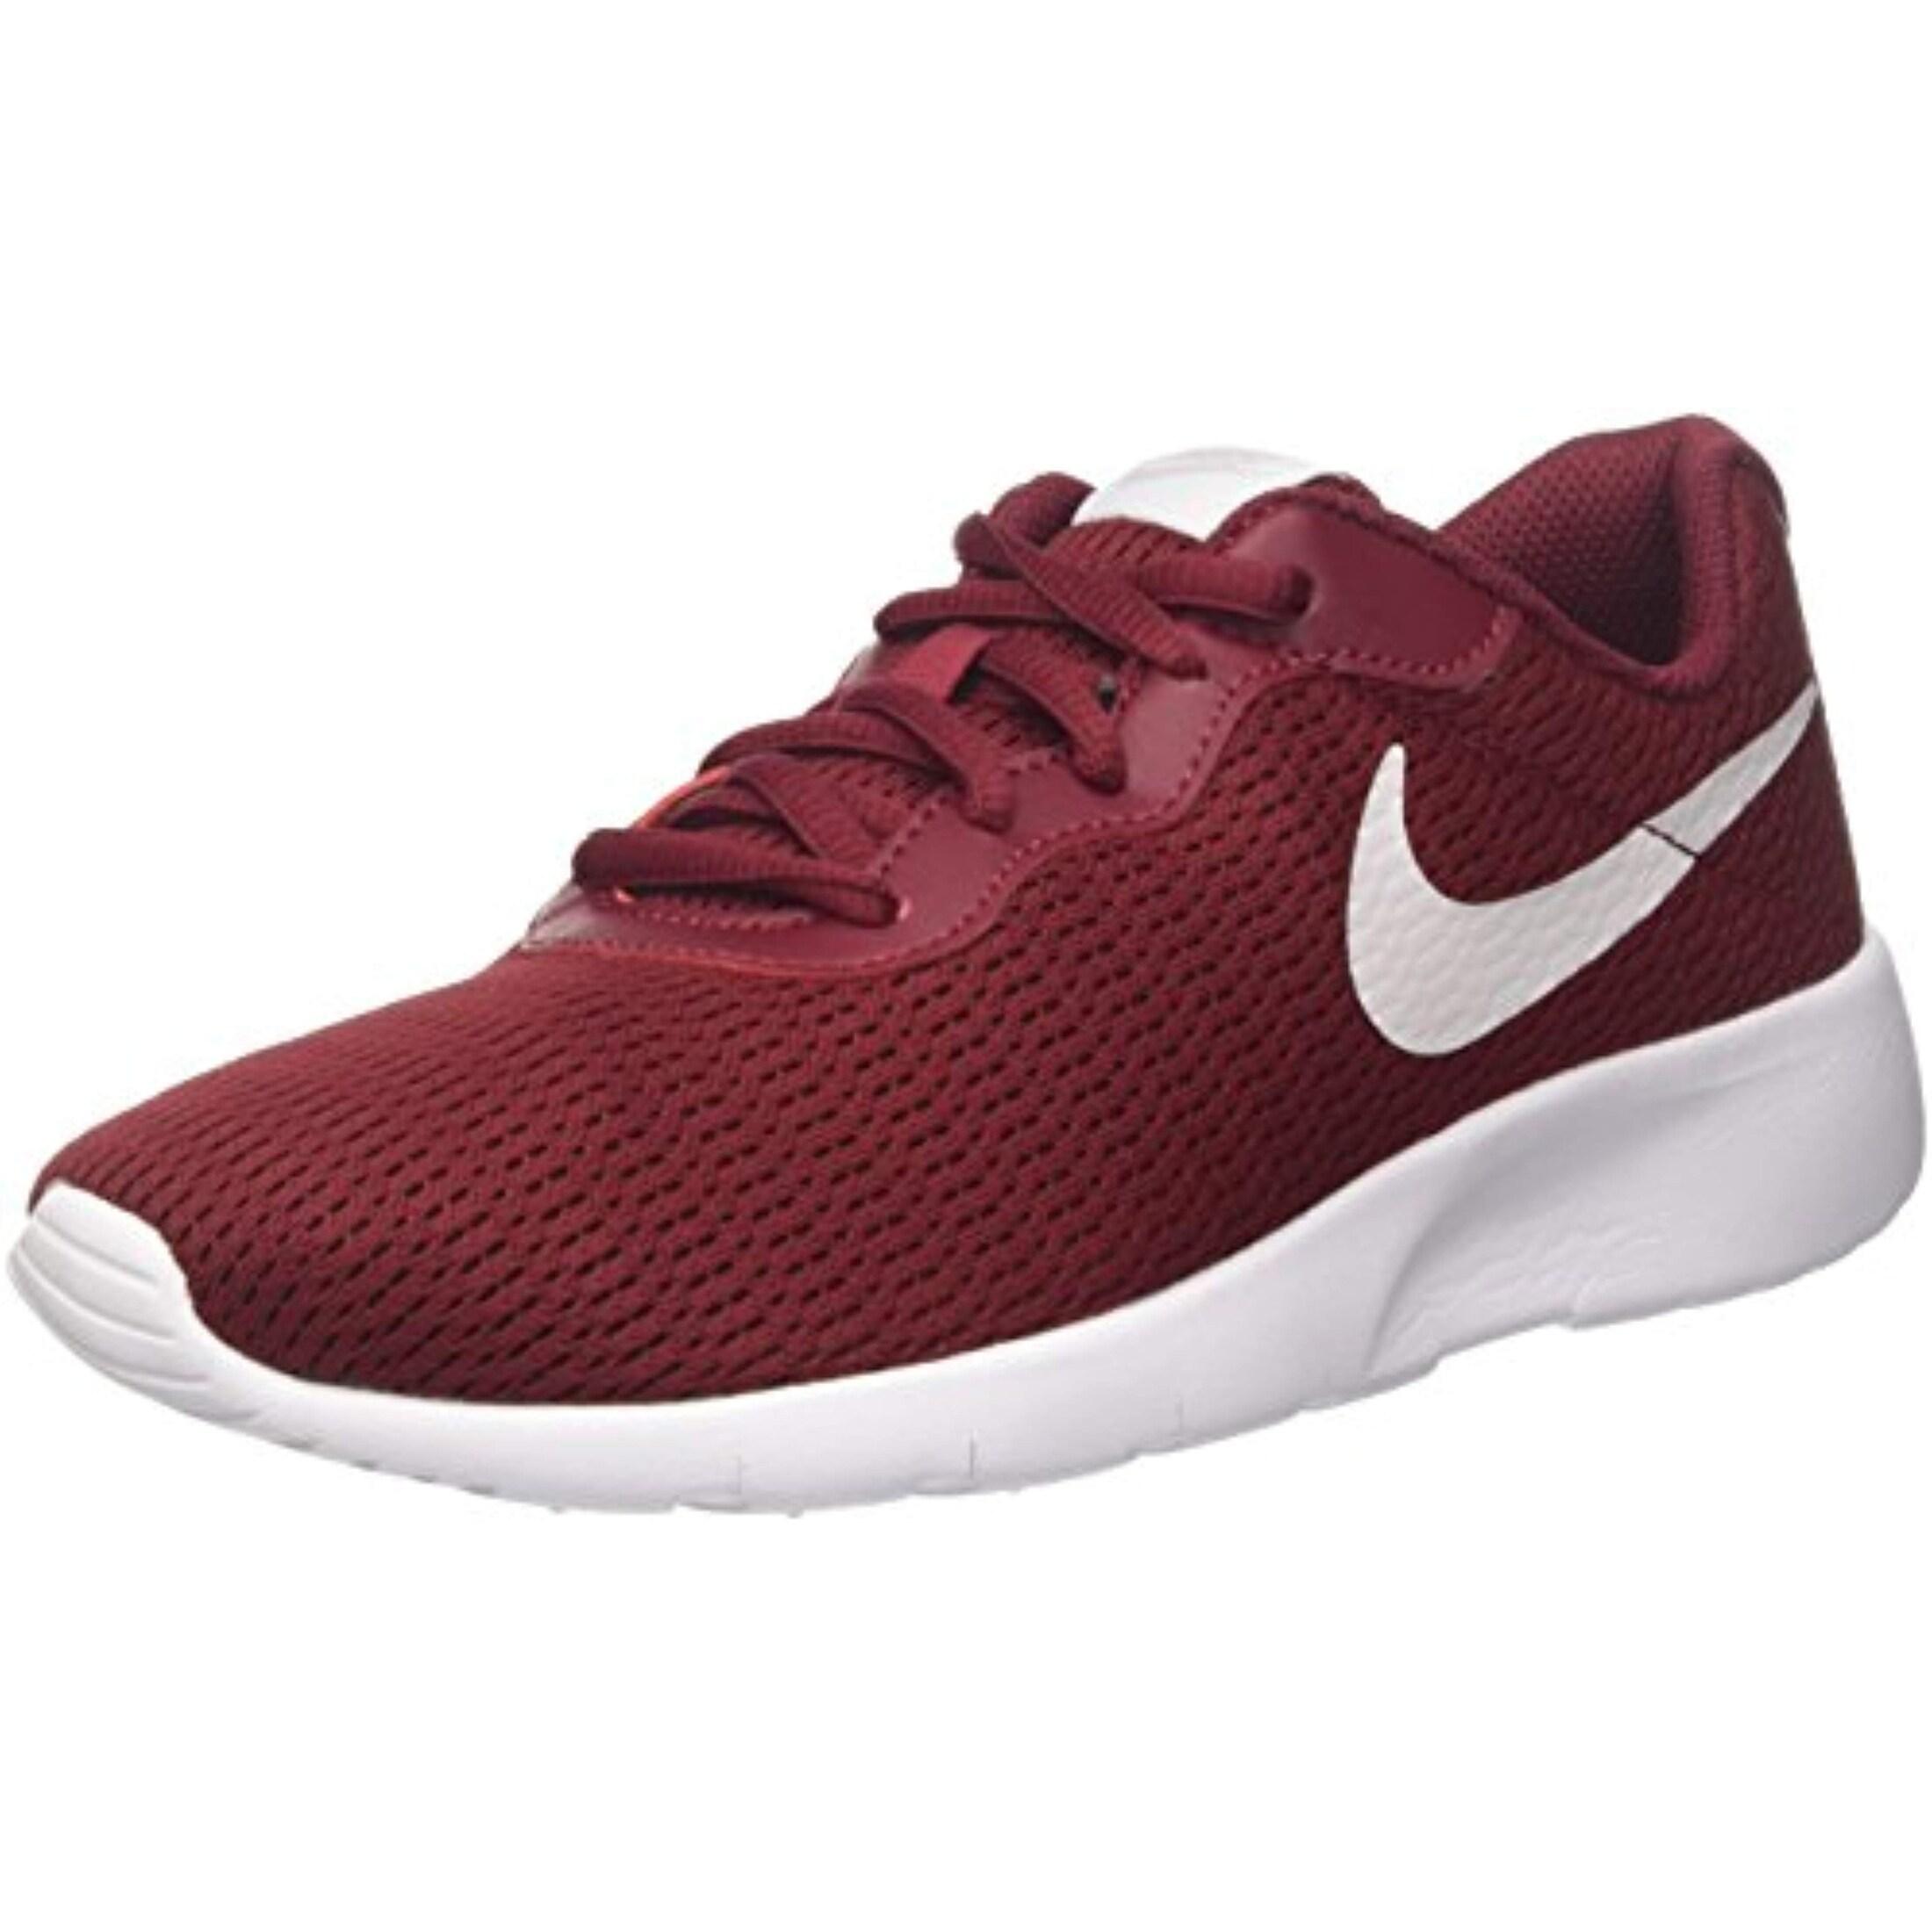 Nike Boys' Tanjun (Bg) Trainers, (Team RedVast Grey White 601)